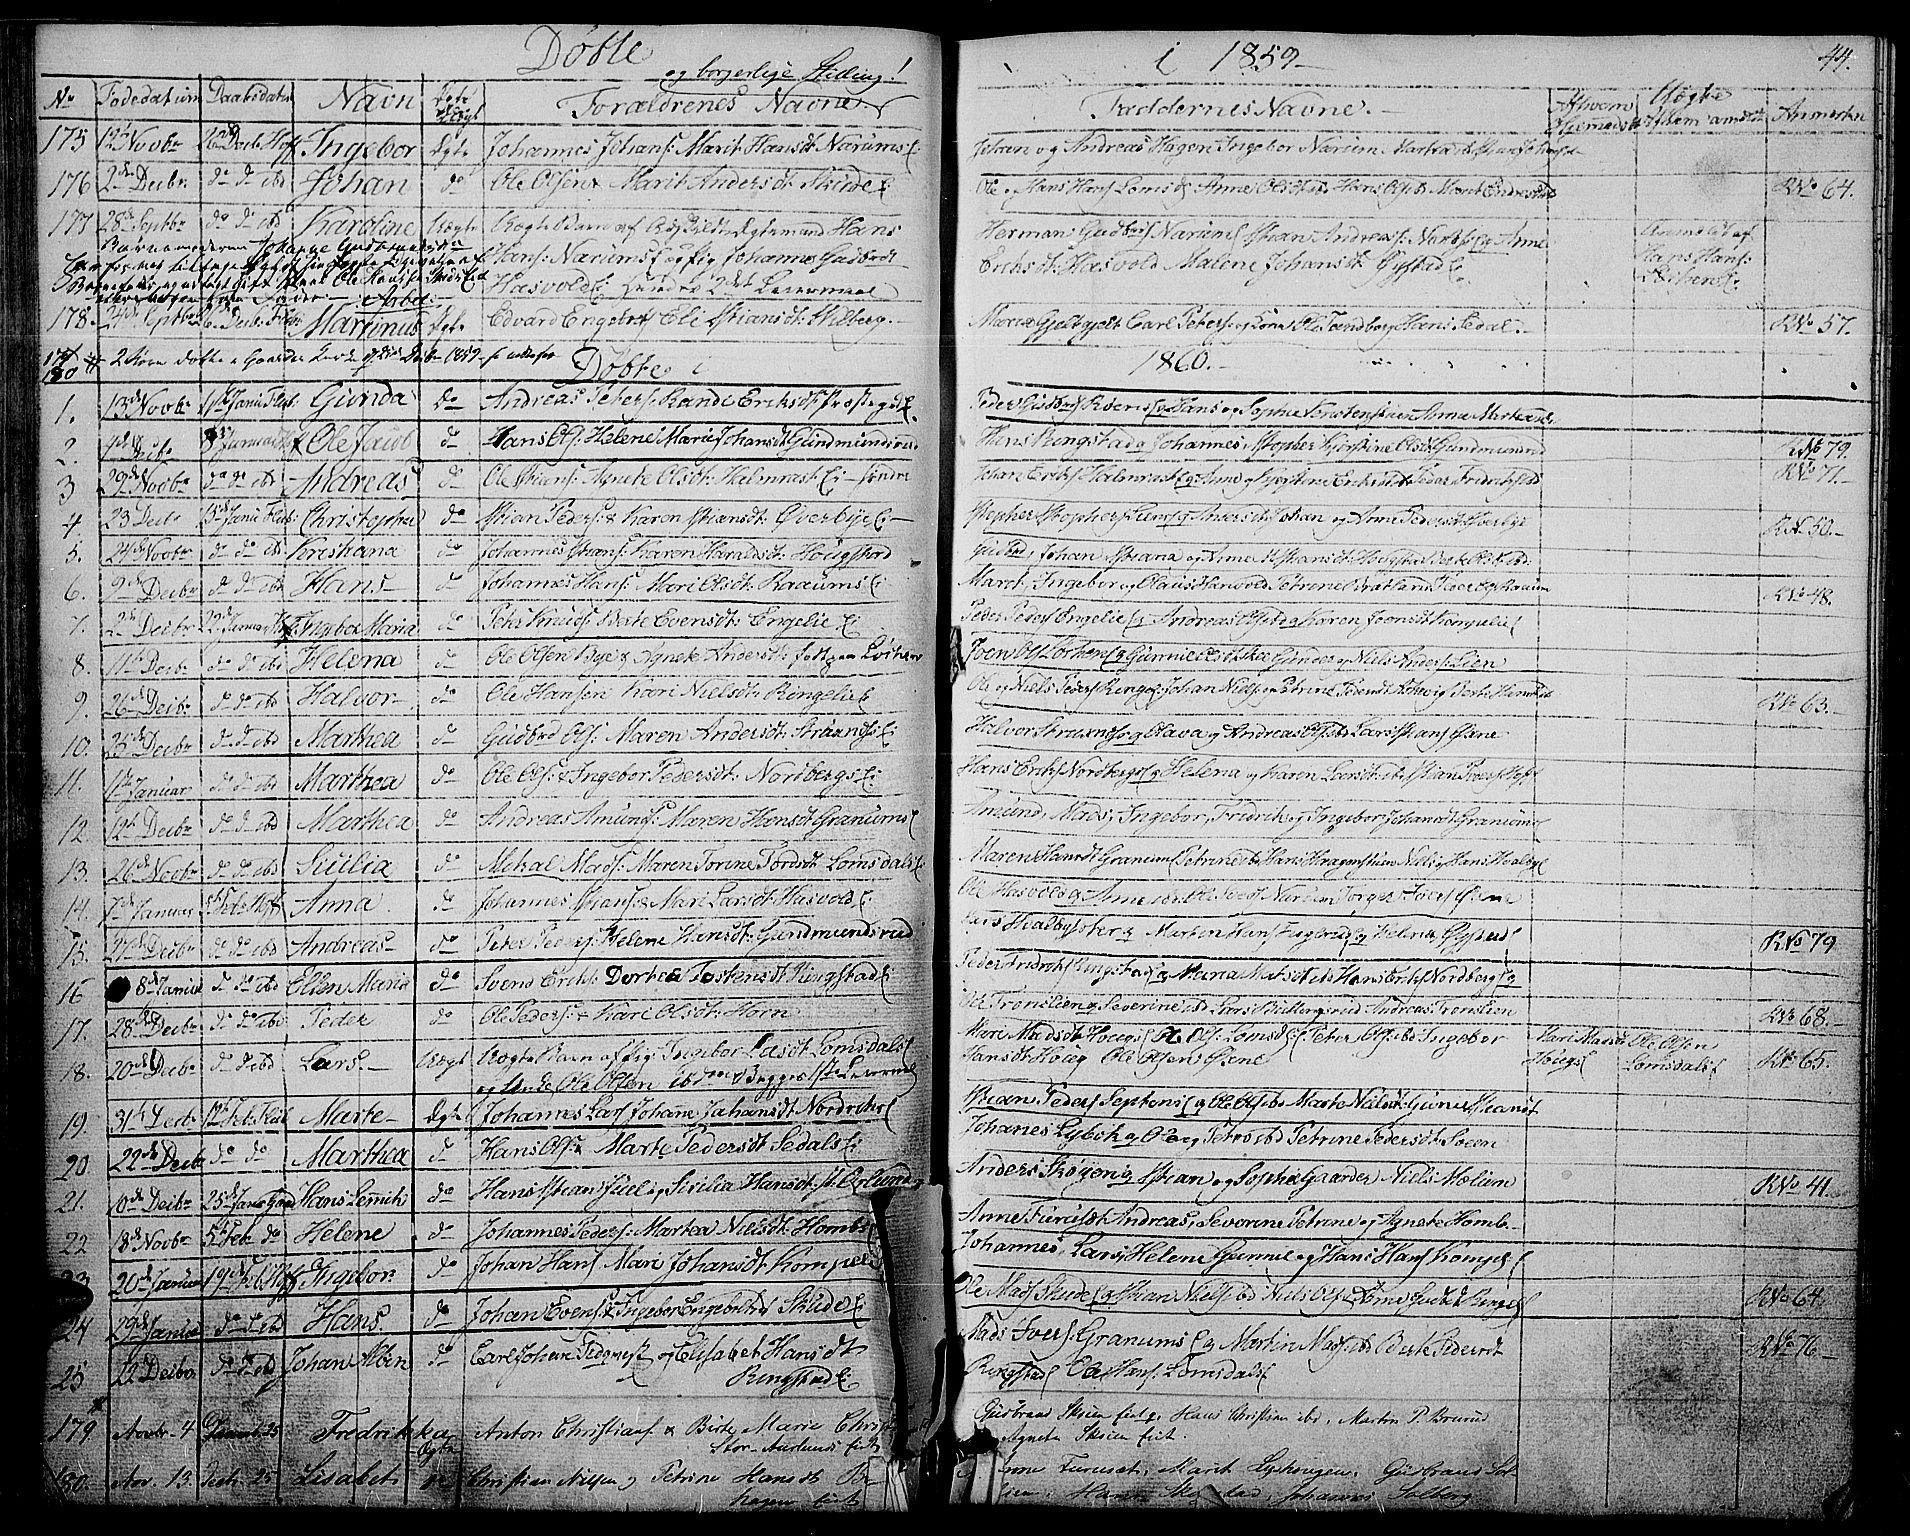 SAH, Søndre Land prestekontor, L/L0001: Klokkerbok nr. 1, 1849-1883, s. 44